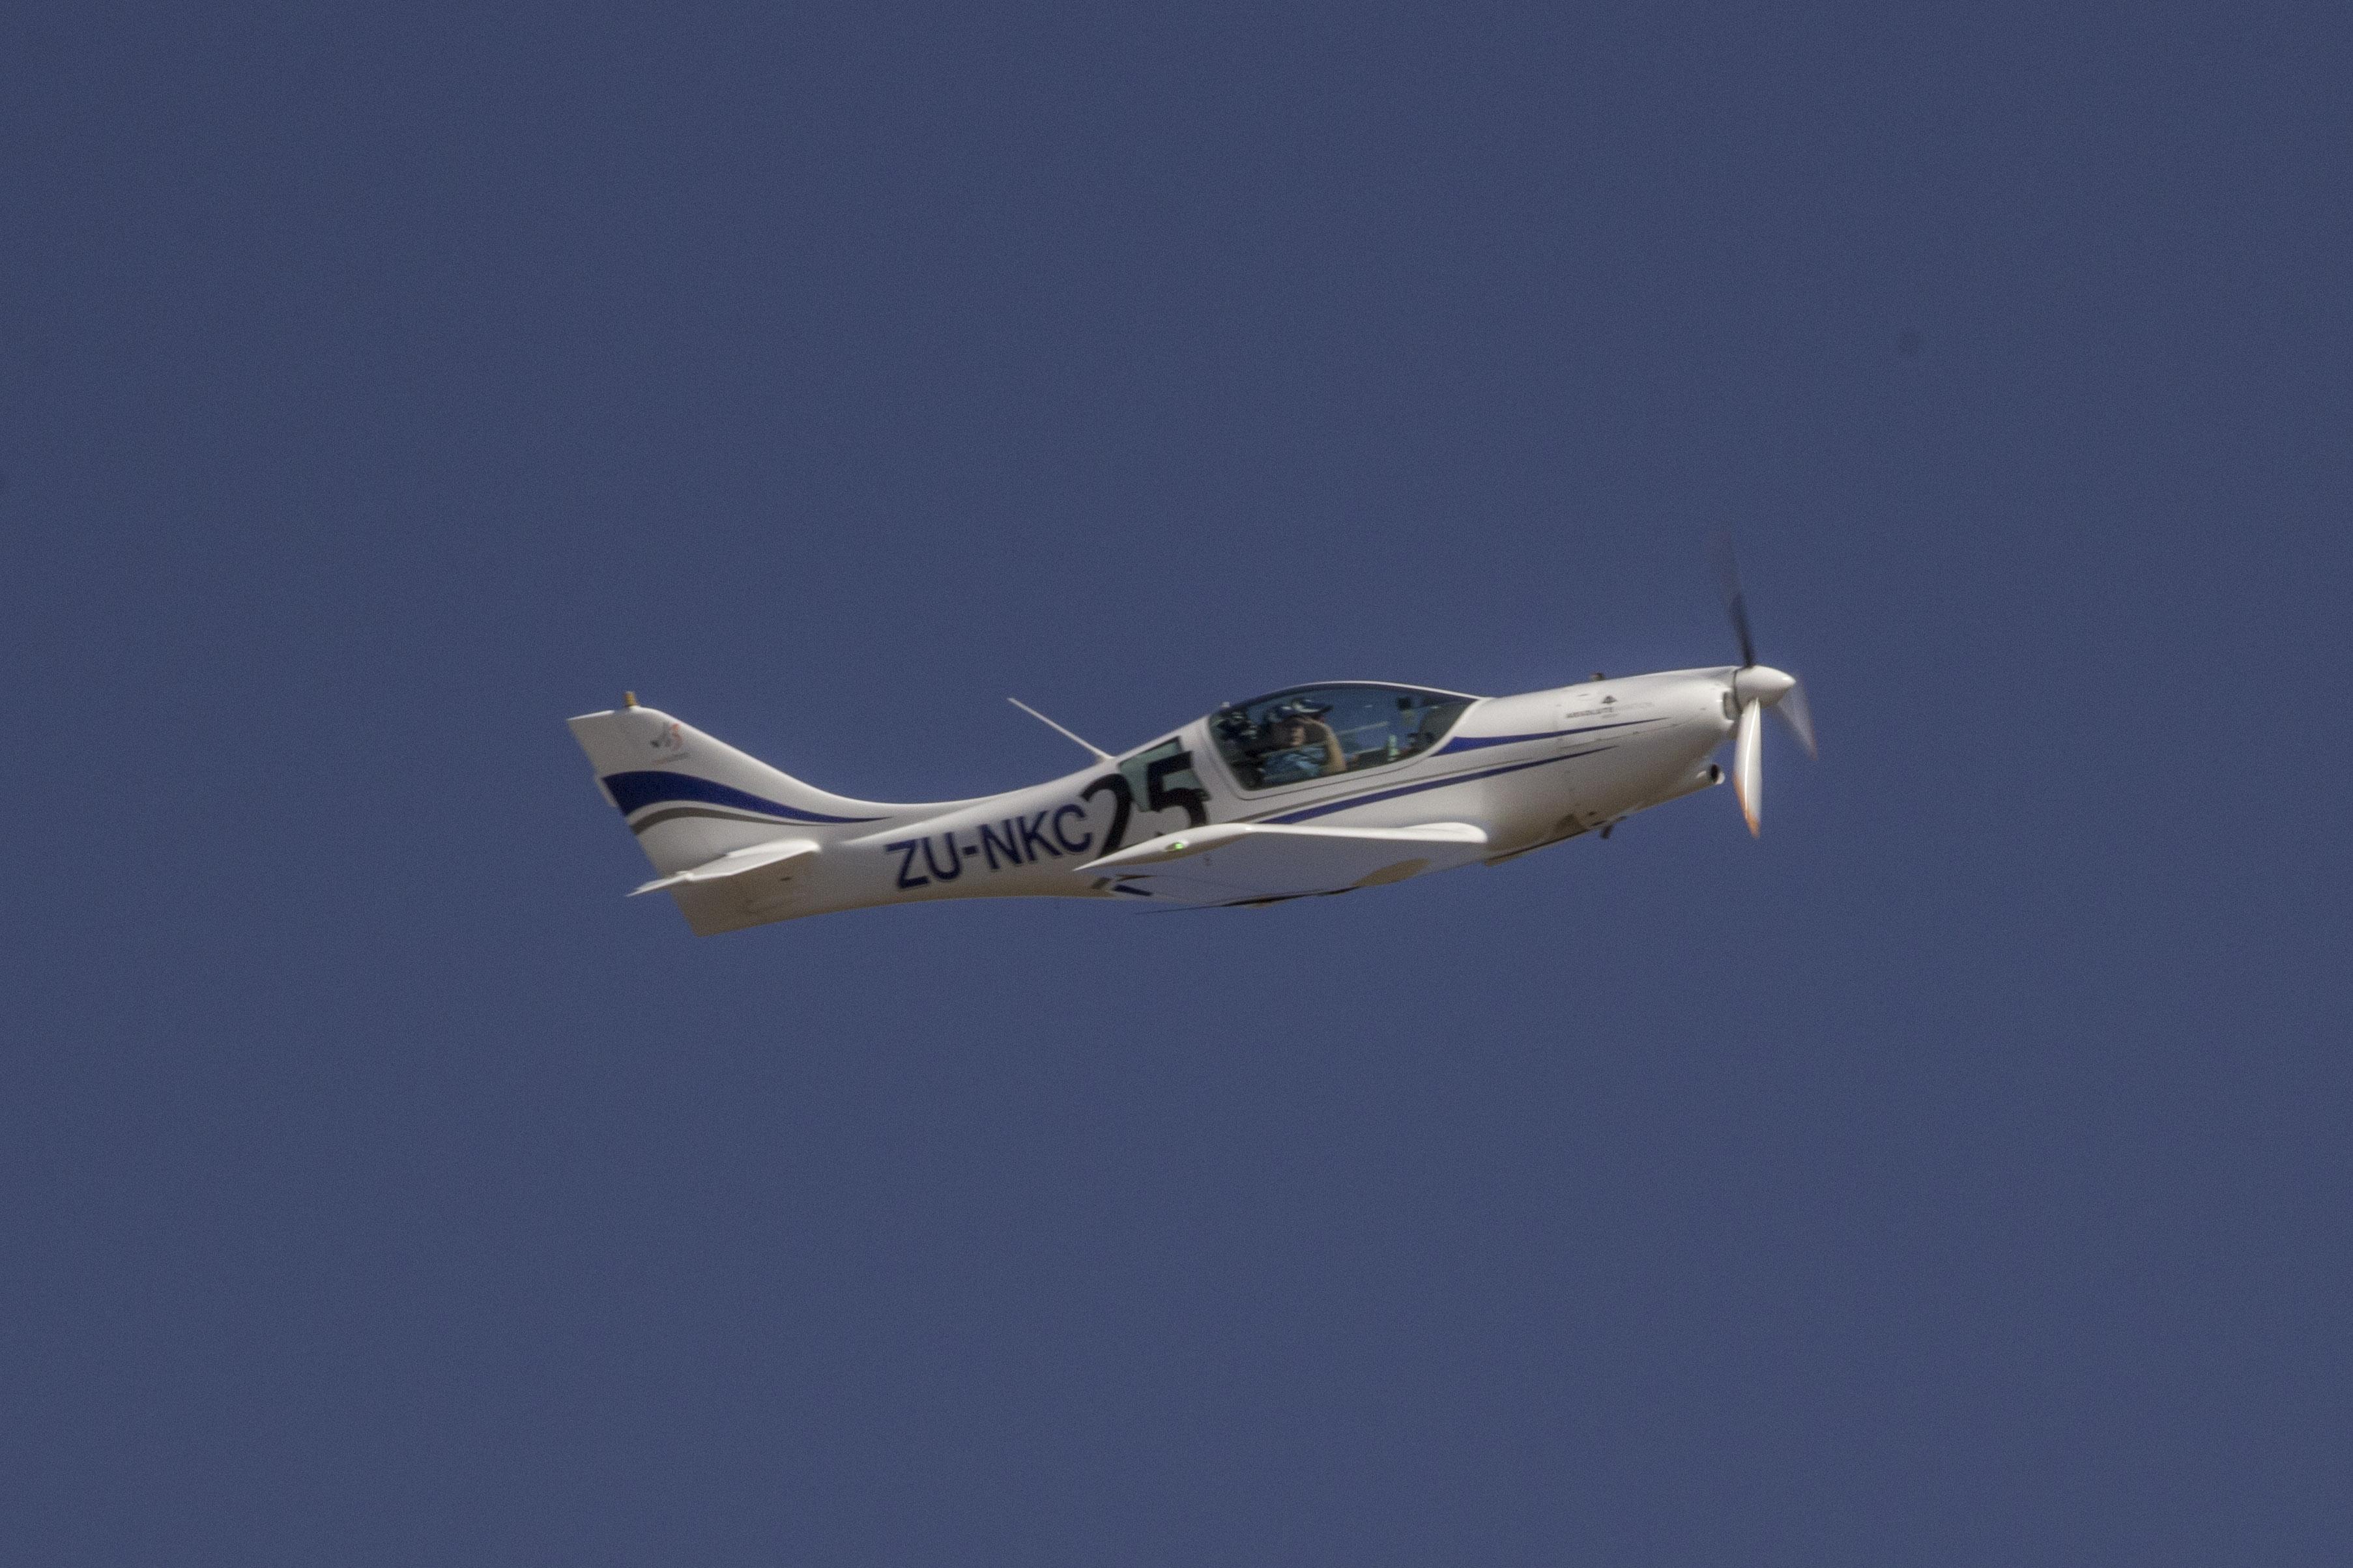 Race 25  ZU-NKC KLN / Aveko  Michiel Jansen Greyling  Jansen Mpumalanga  Lowveld Aero Club